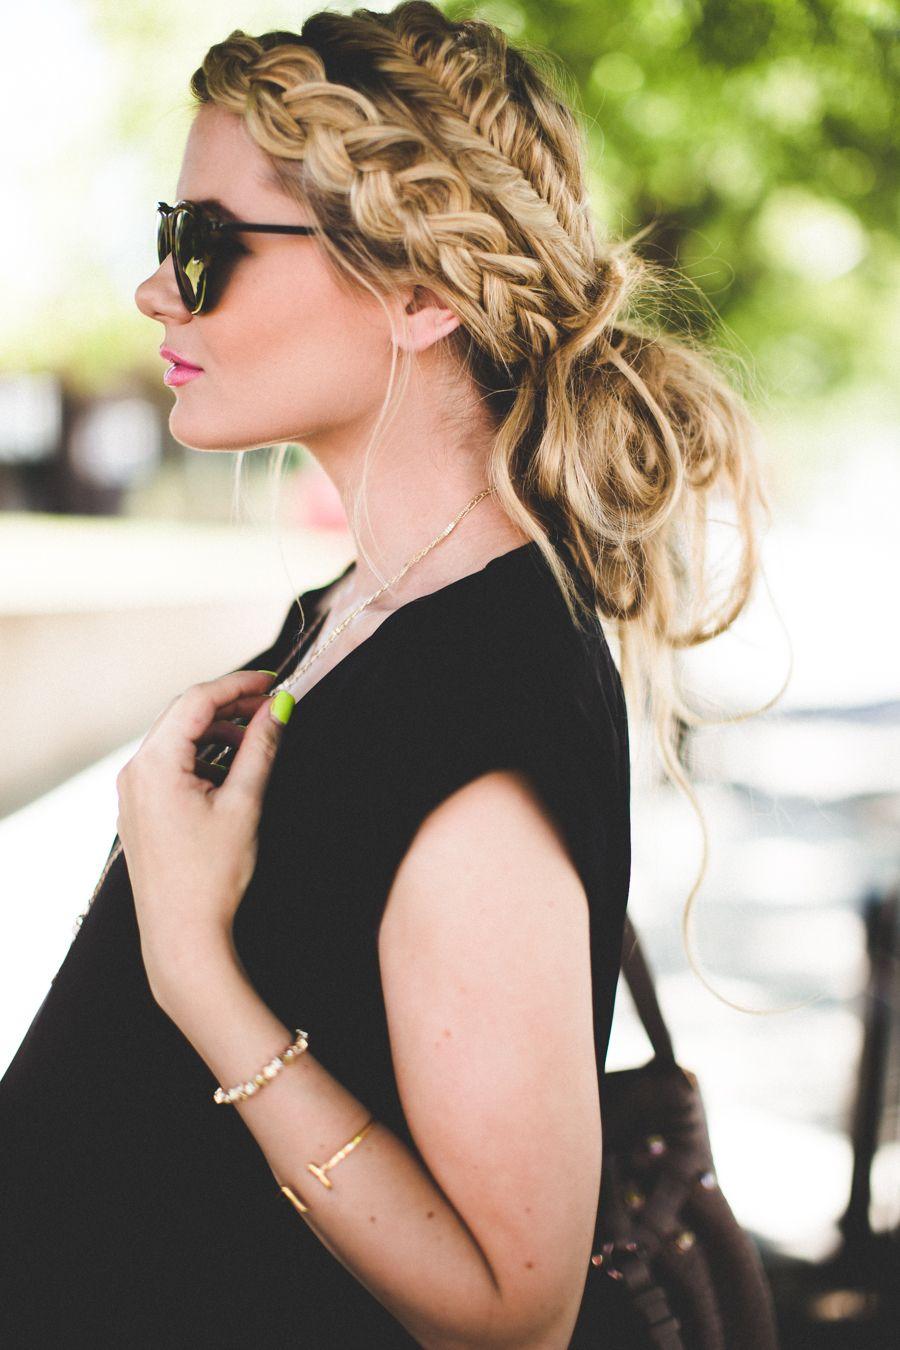 Photo from tumblr fashion pinterest barefoot blonde bun hair